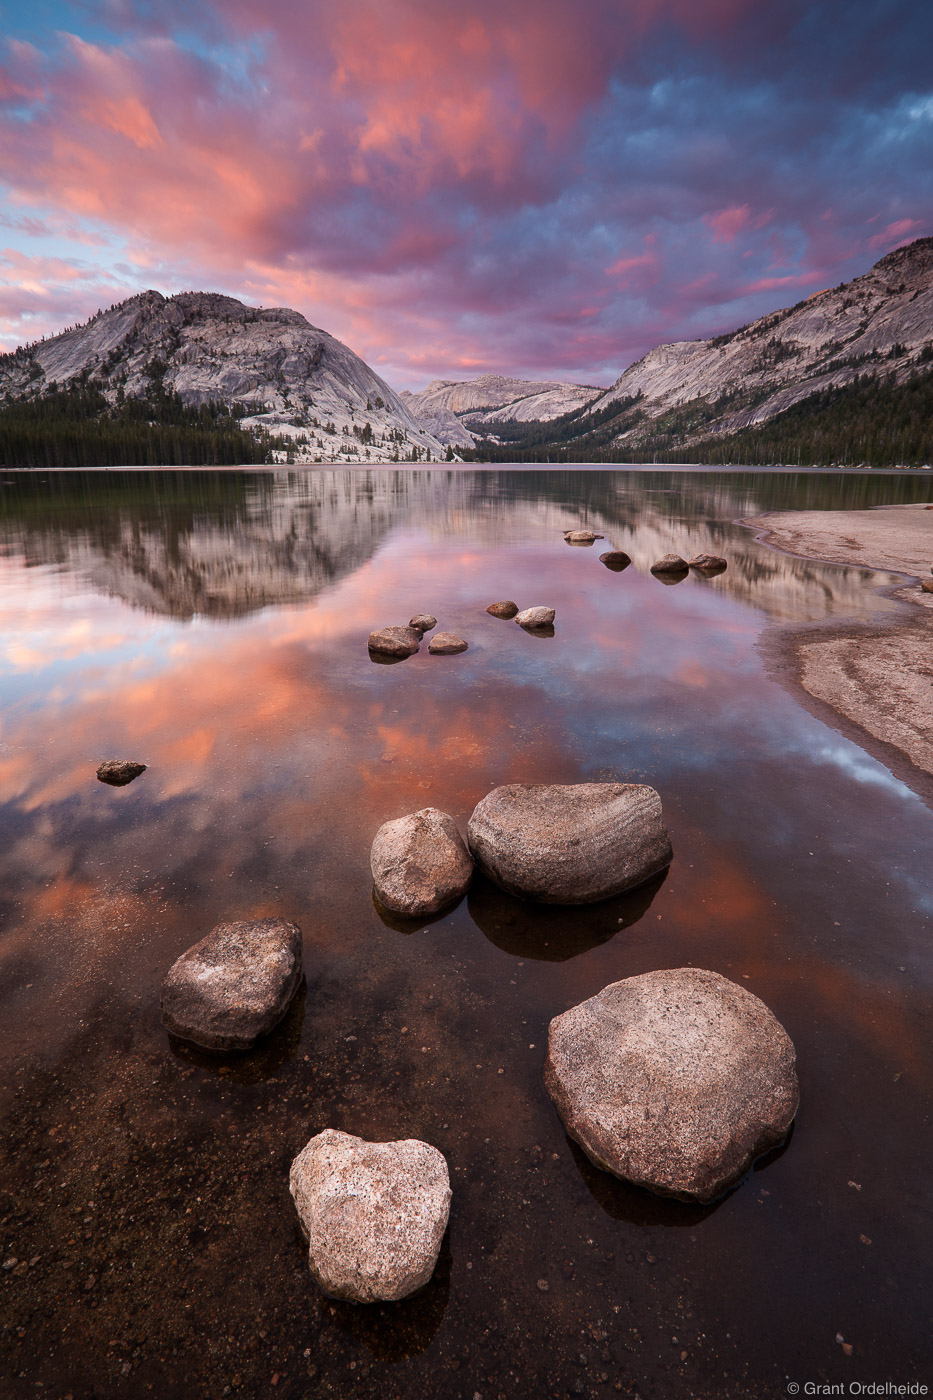 tenaya, lake, sunset, popular, yosemite, national park, california, usa, high country, photo